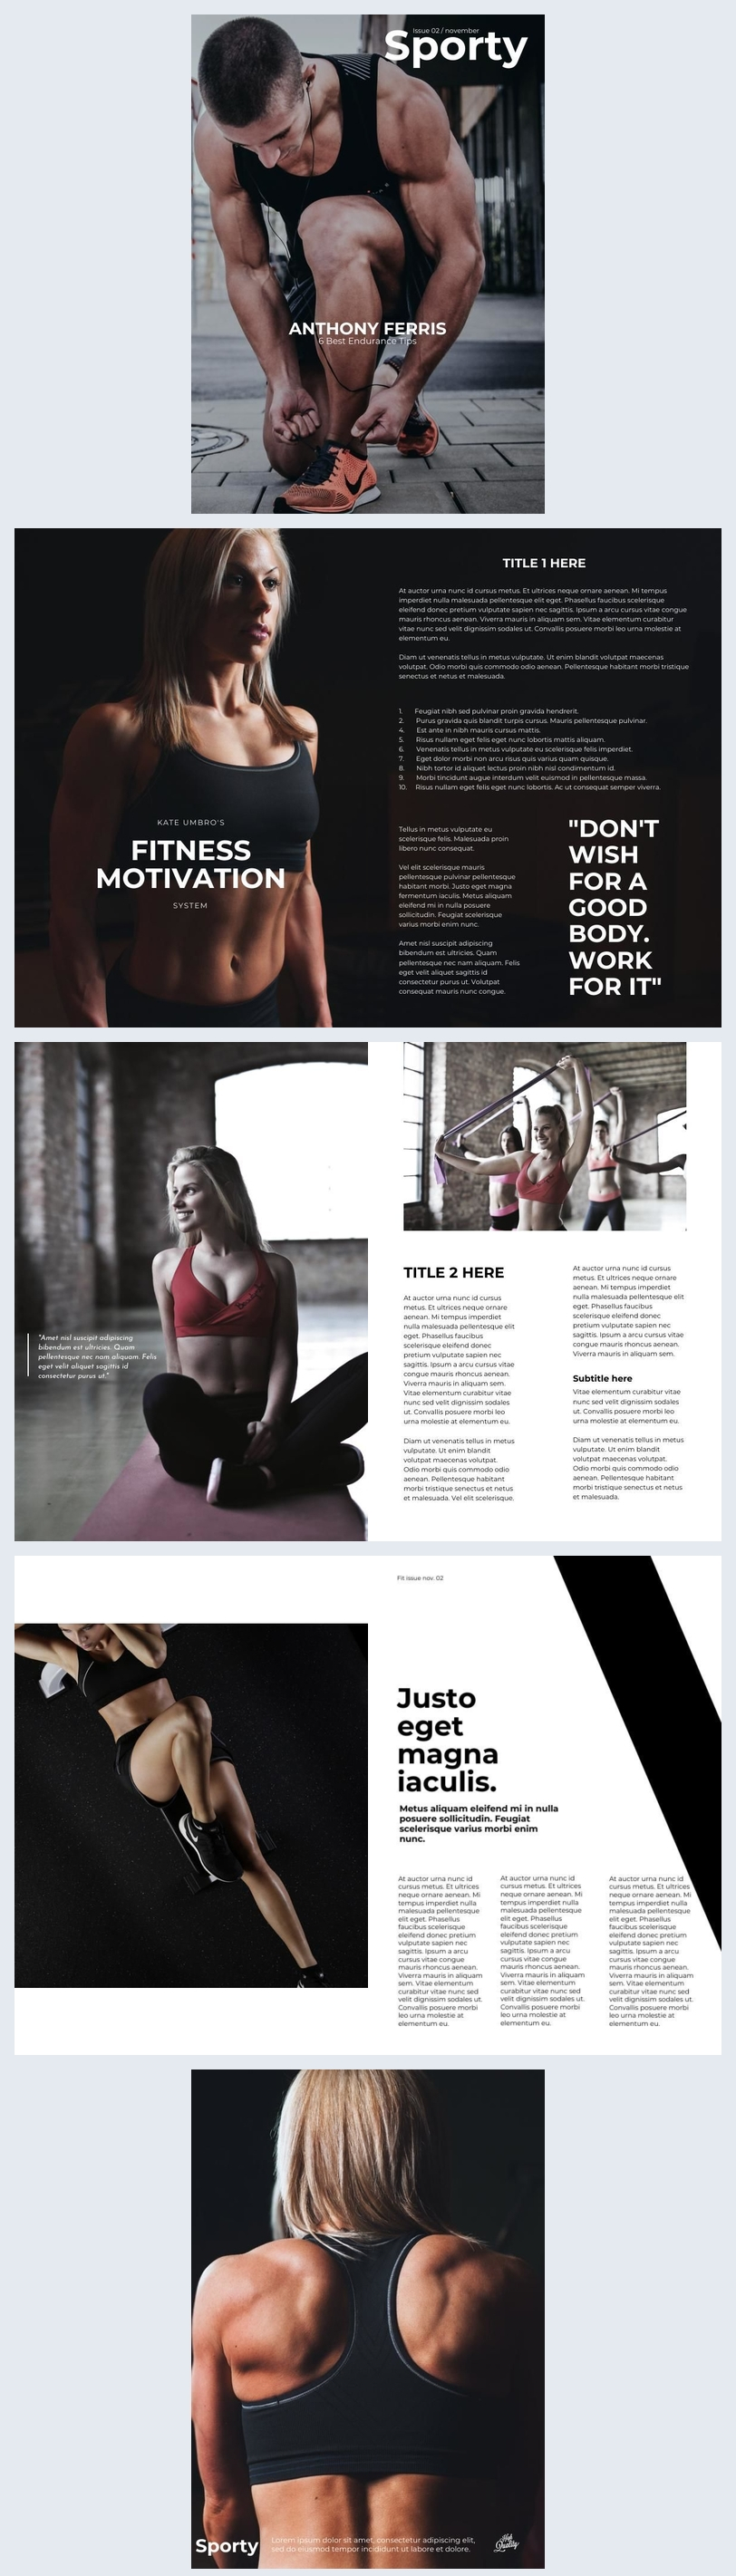 Exemplo de Modelo de Revista Esportiva